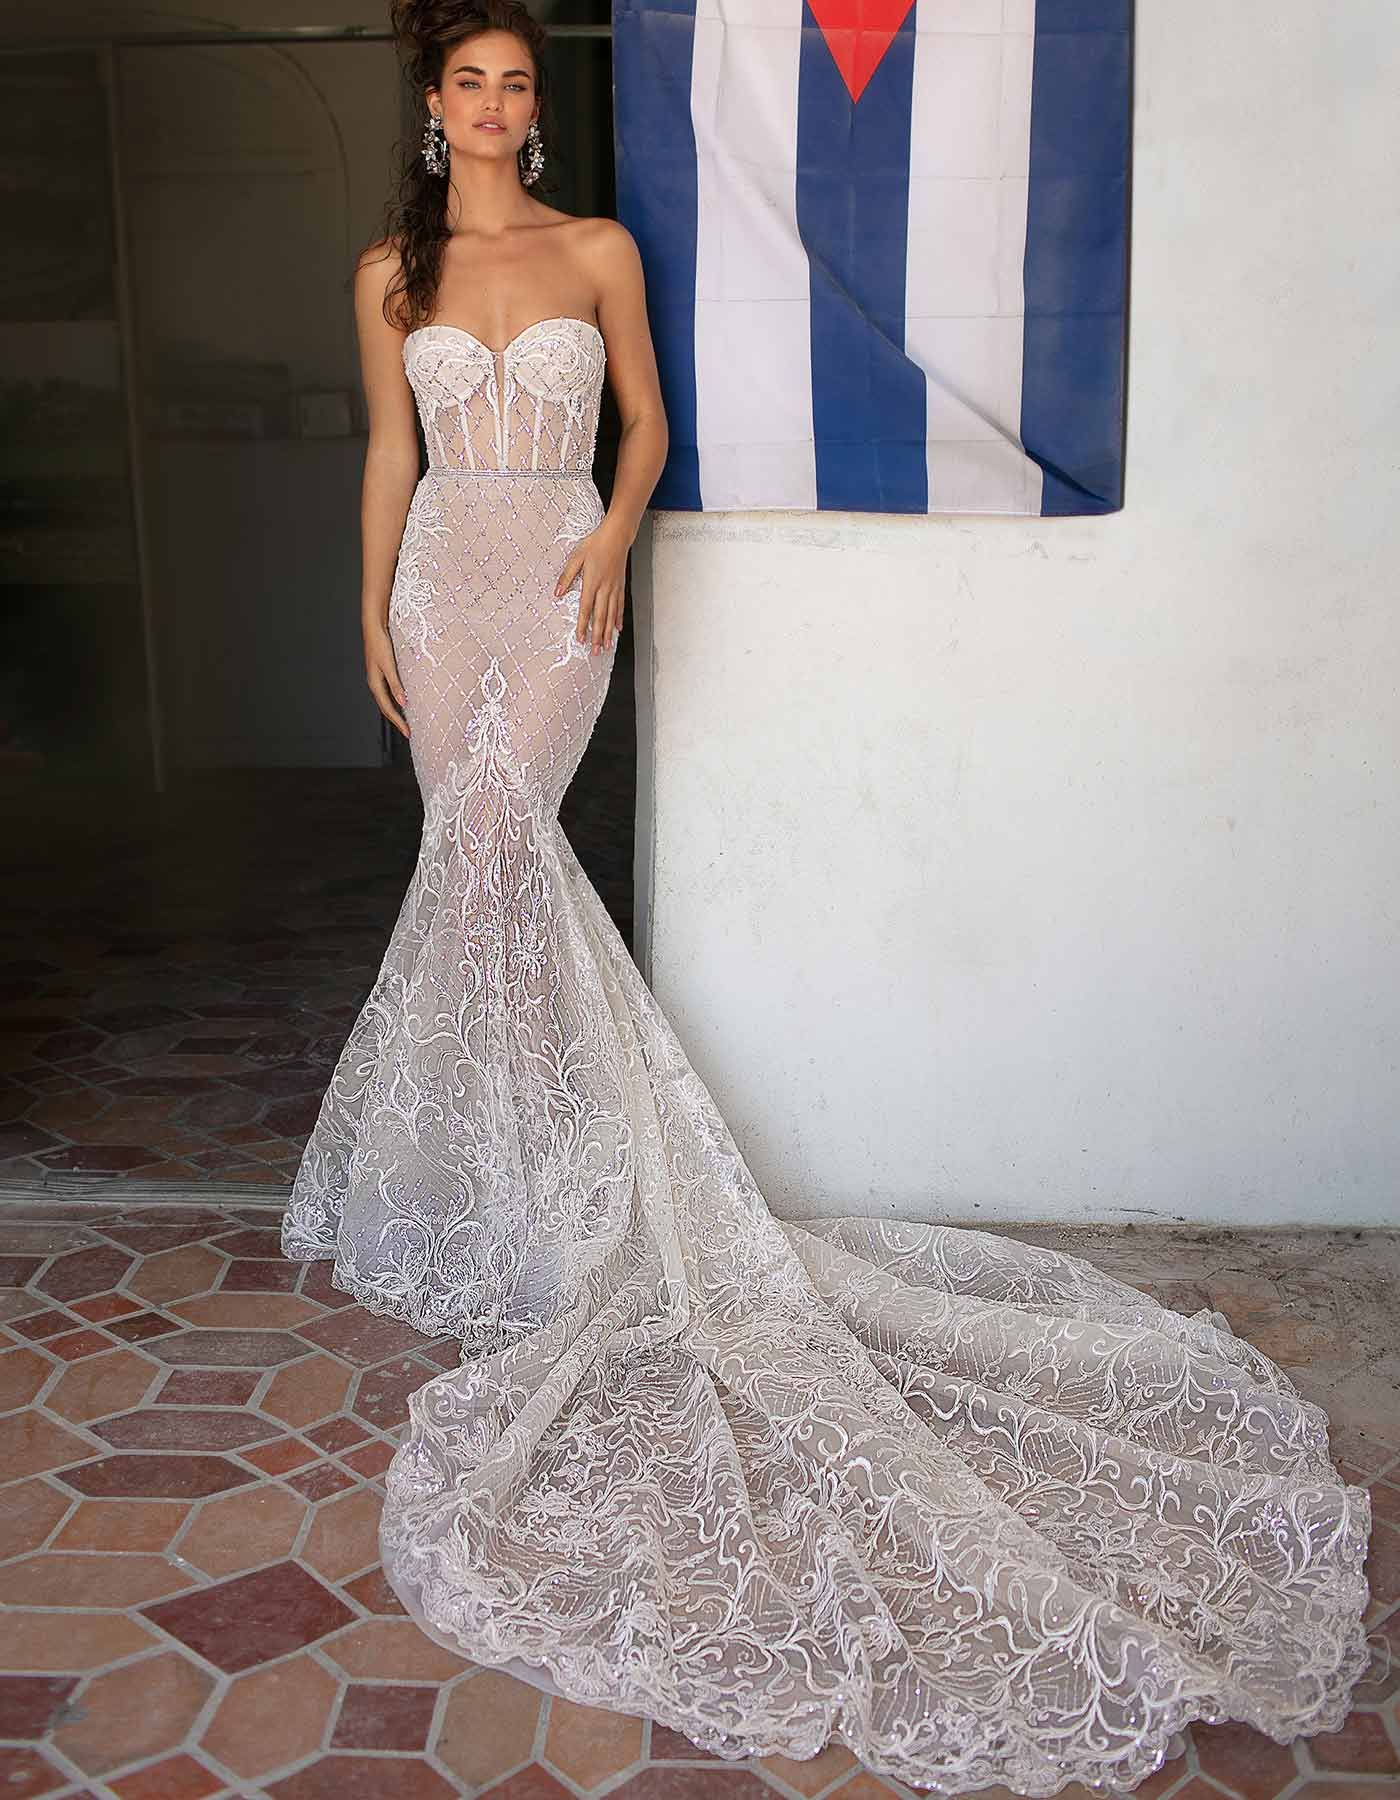 059dd375bfac2 19-03 by BERTA from the SS 2019 Miami Collection | #RaffaeleCiuca #BERTA  #BertaBride #DesignerWeddingDress #Fashion #Designer #Bride #BrideInspo  #Strapless ...